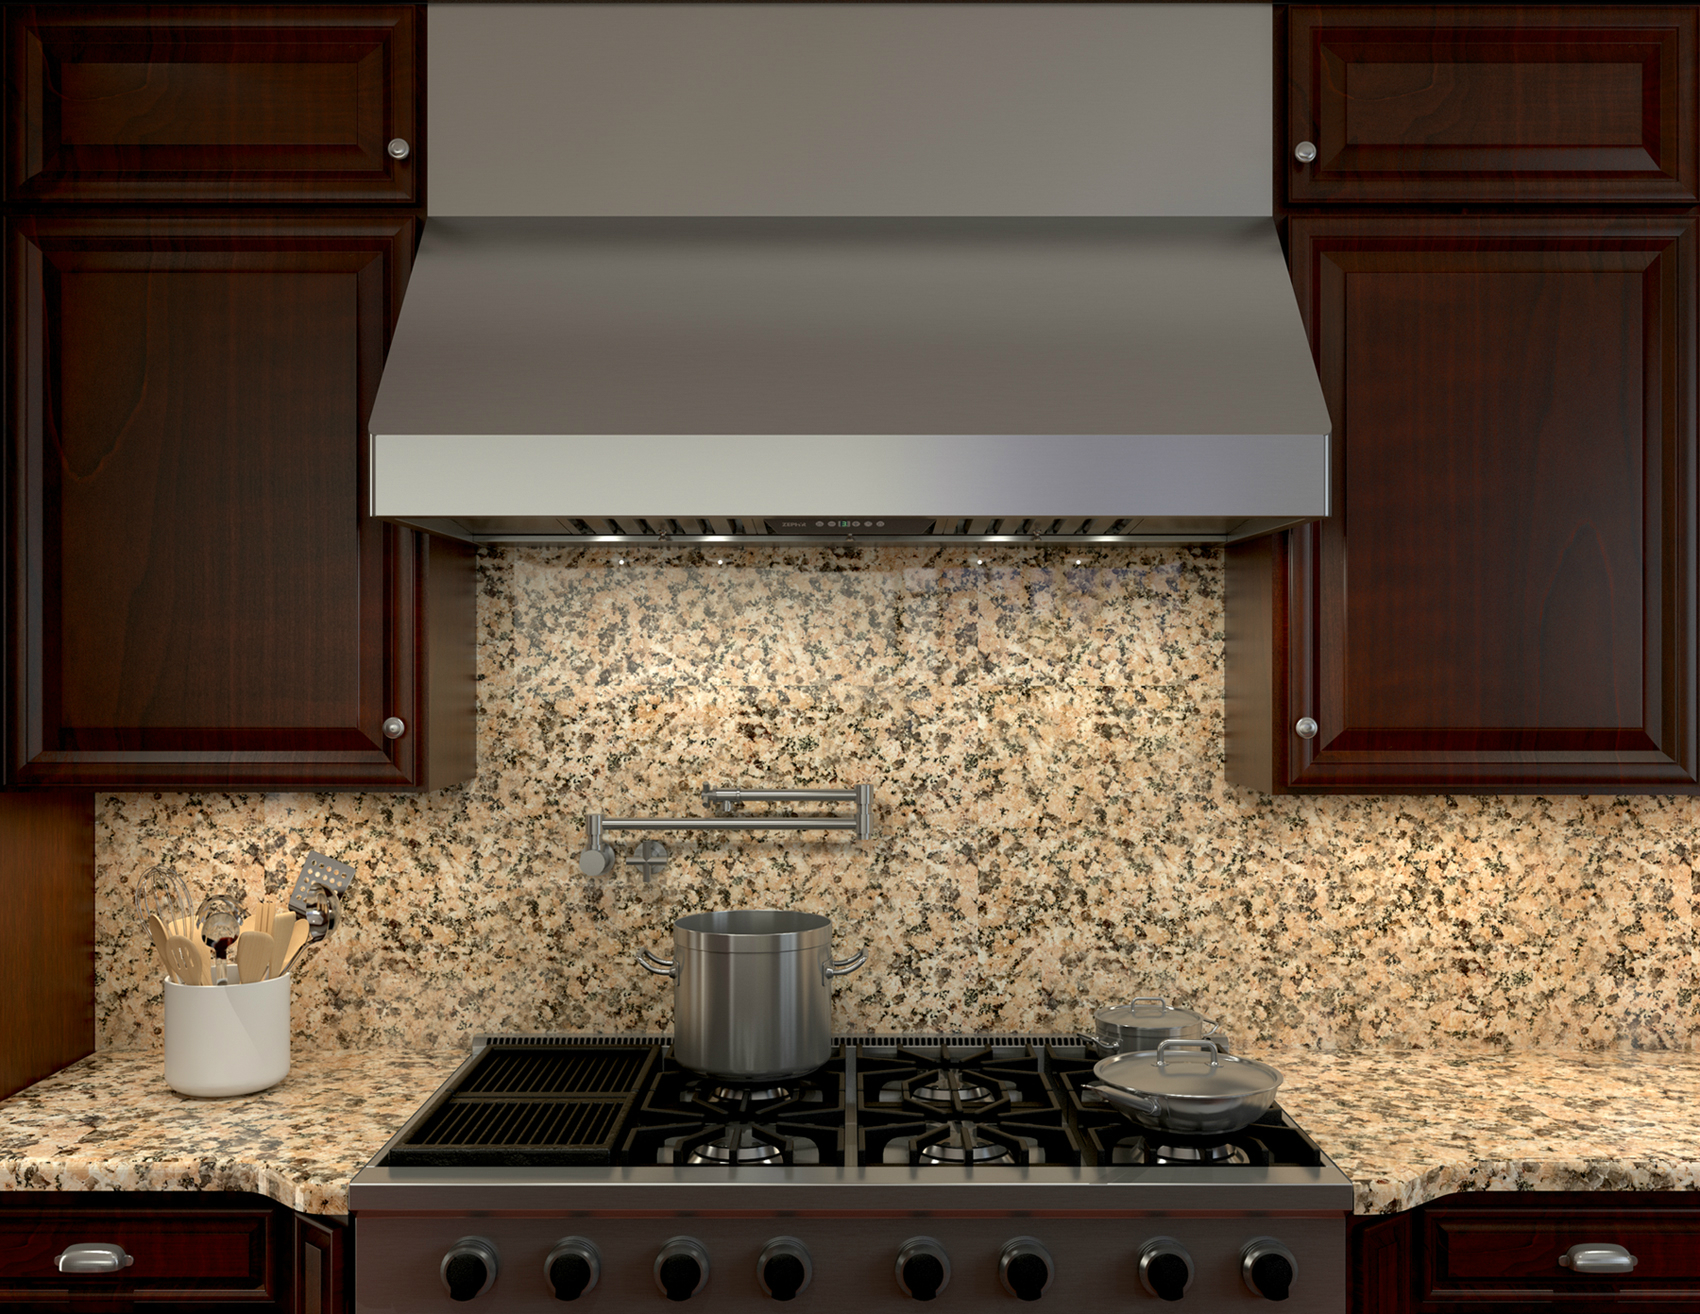 with for mcallen under look kitchen your range hoods craigslist cabinet updated zephyr hood modern furniture artcraft combine also lighting